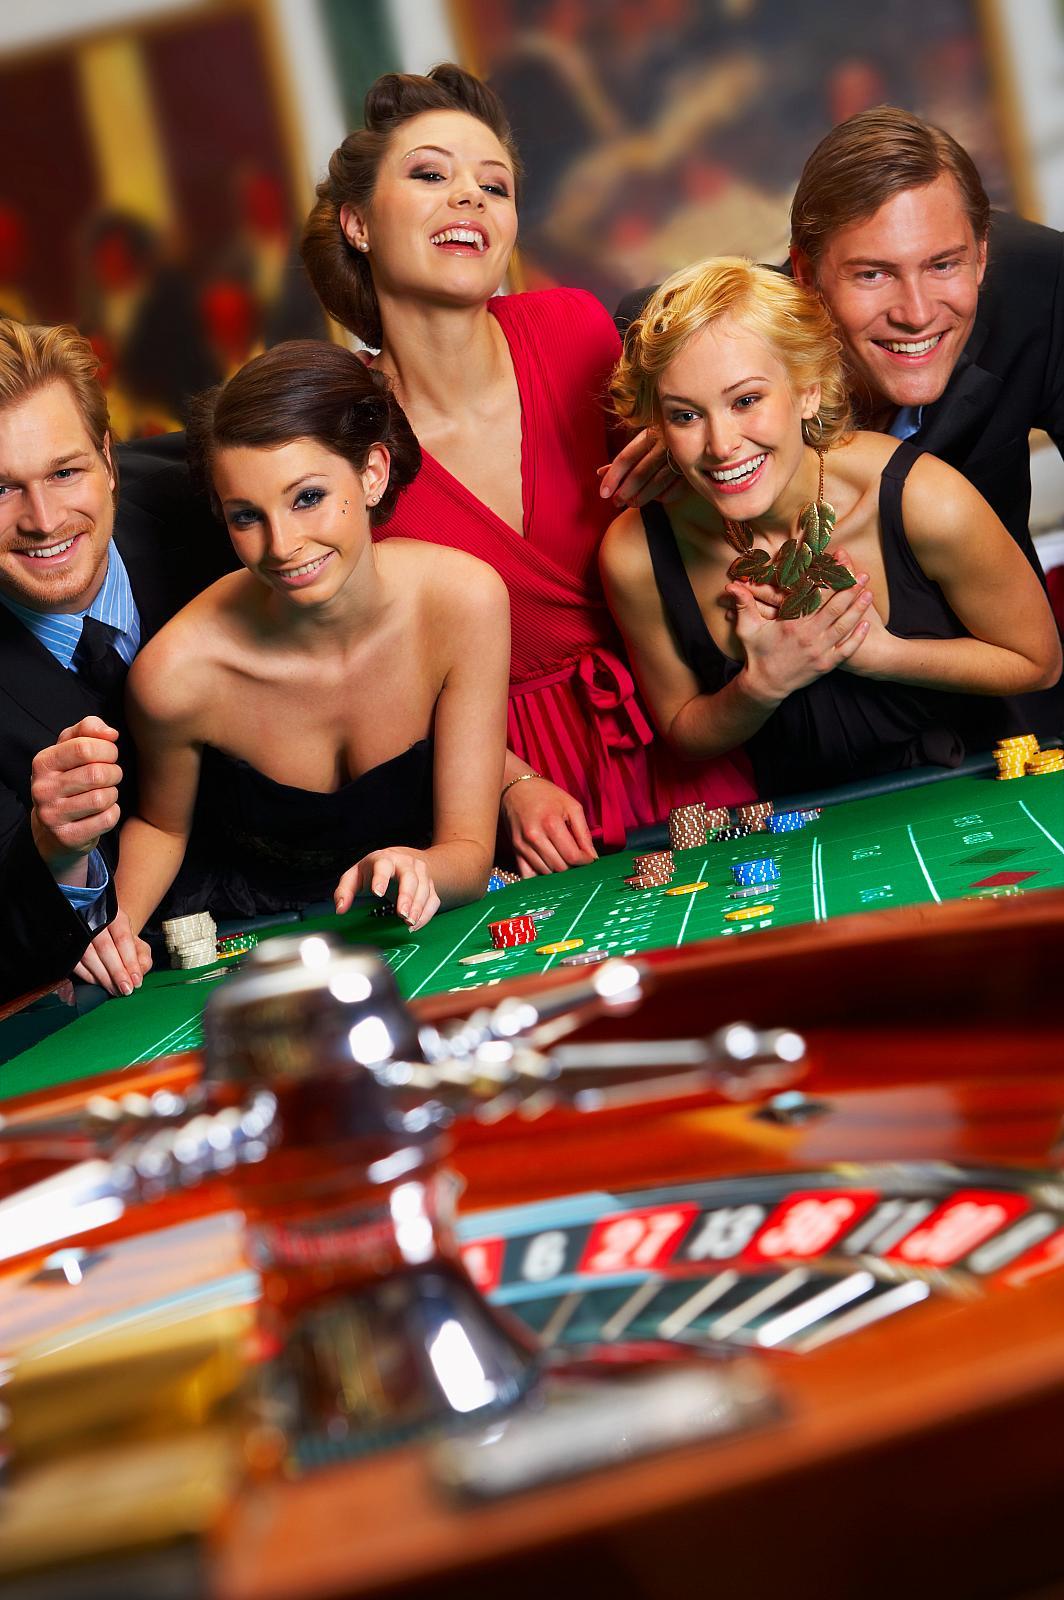 usa gambling best sports sites